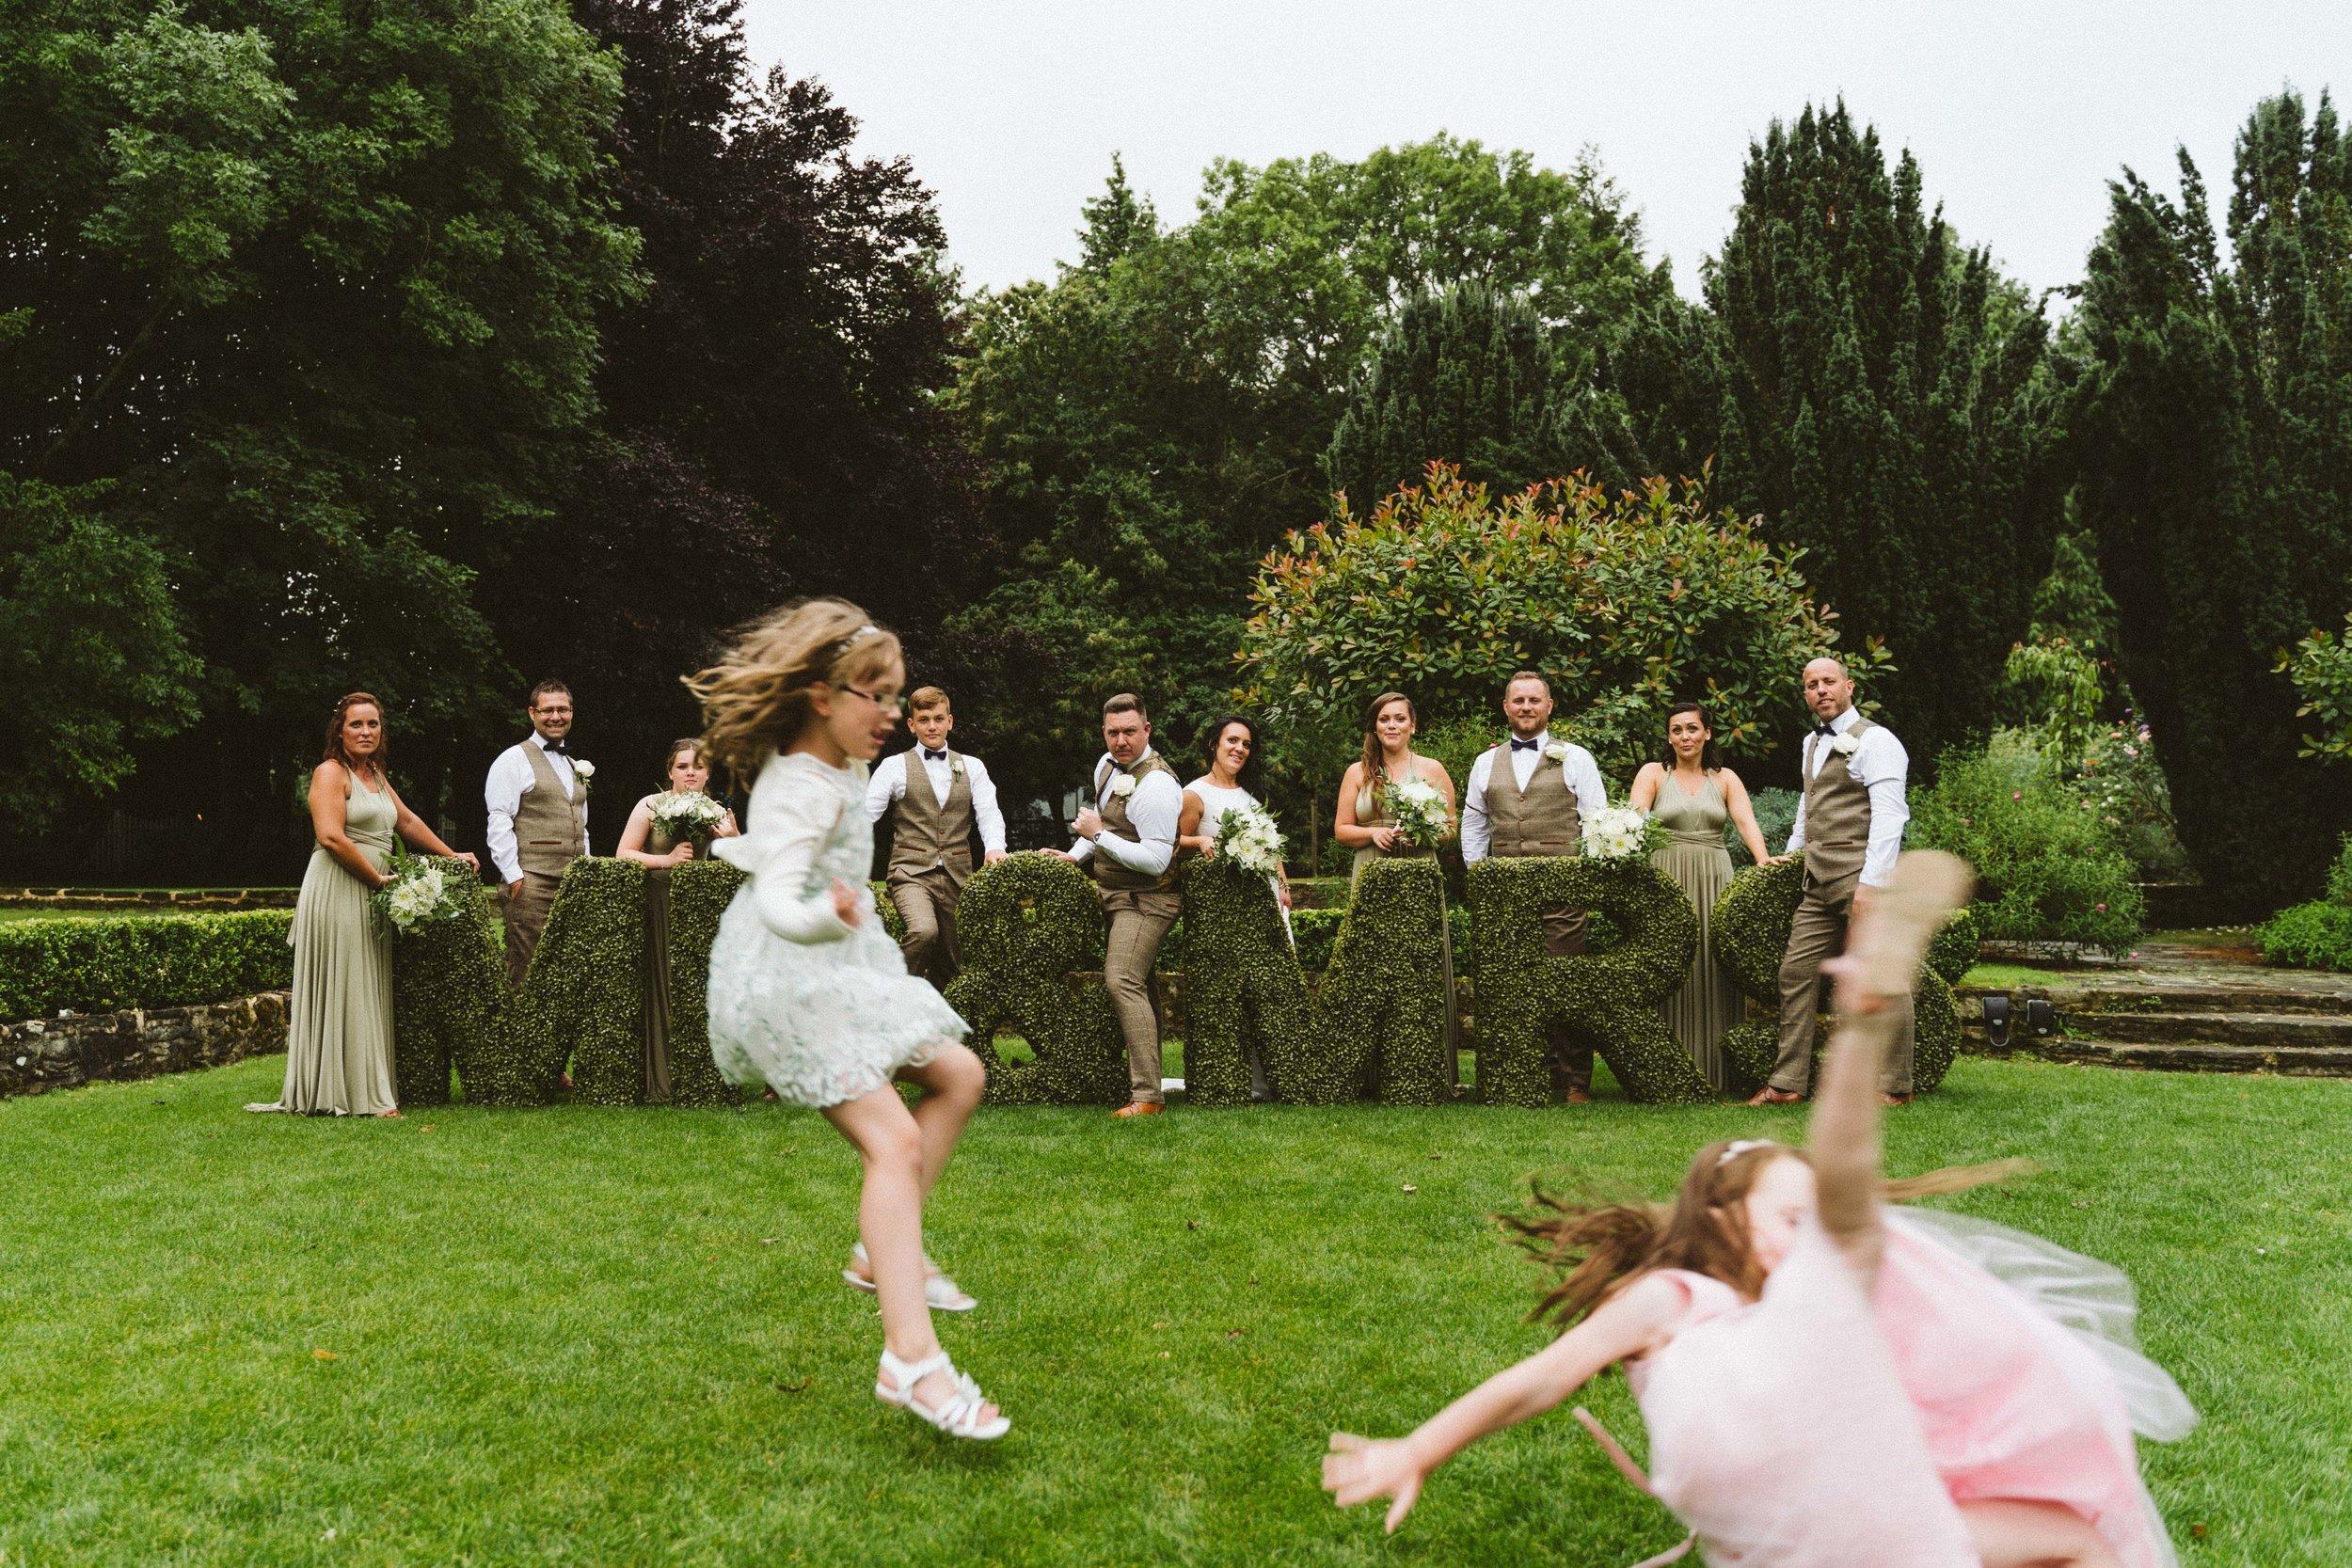 kent-wedding-photographer-107901.jpg